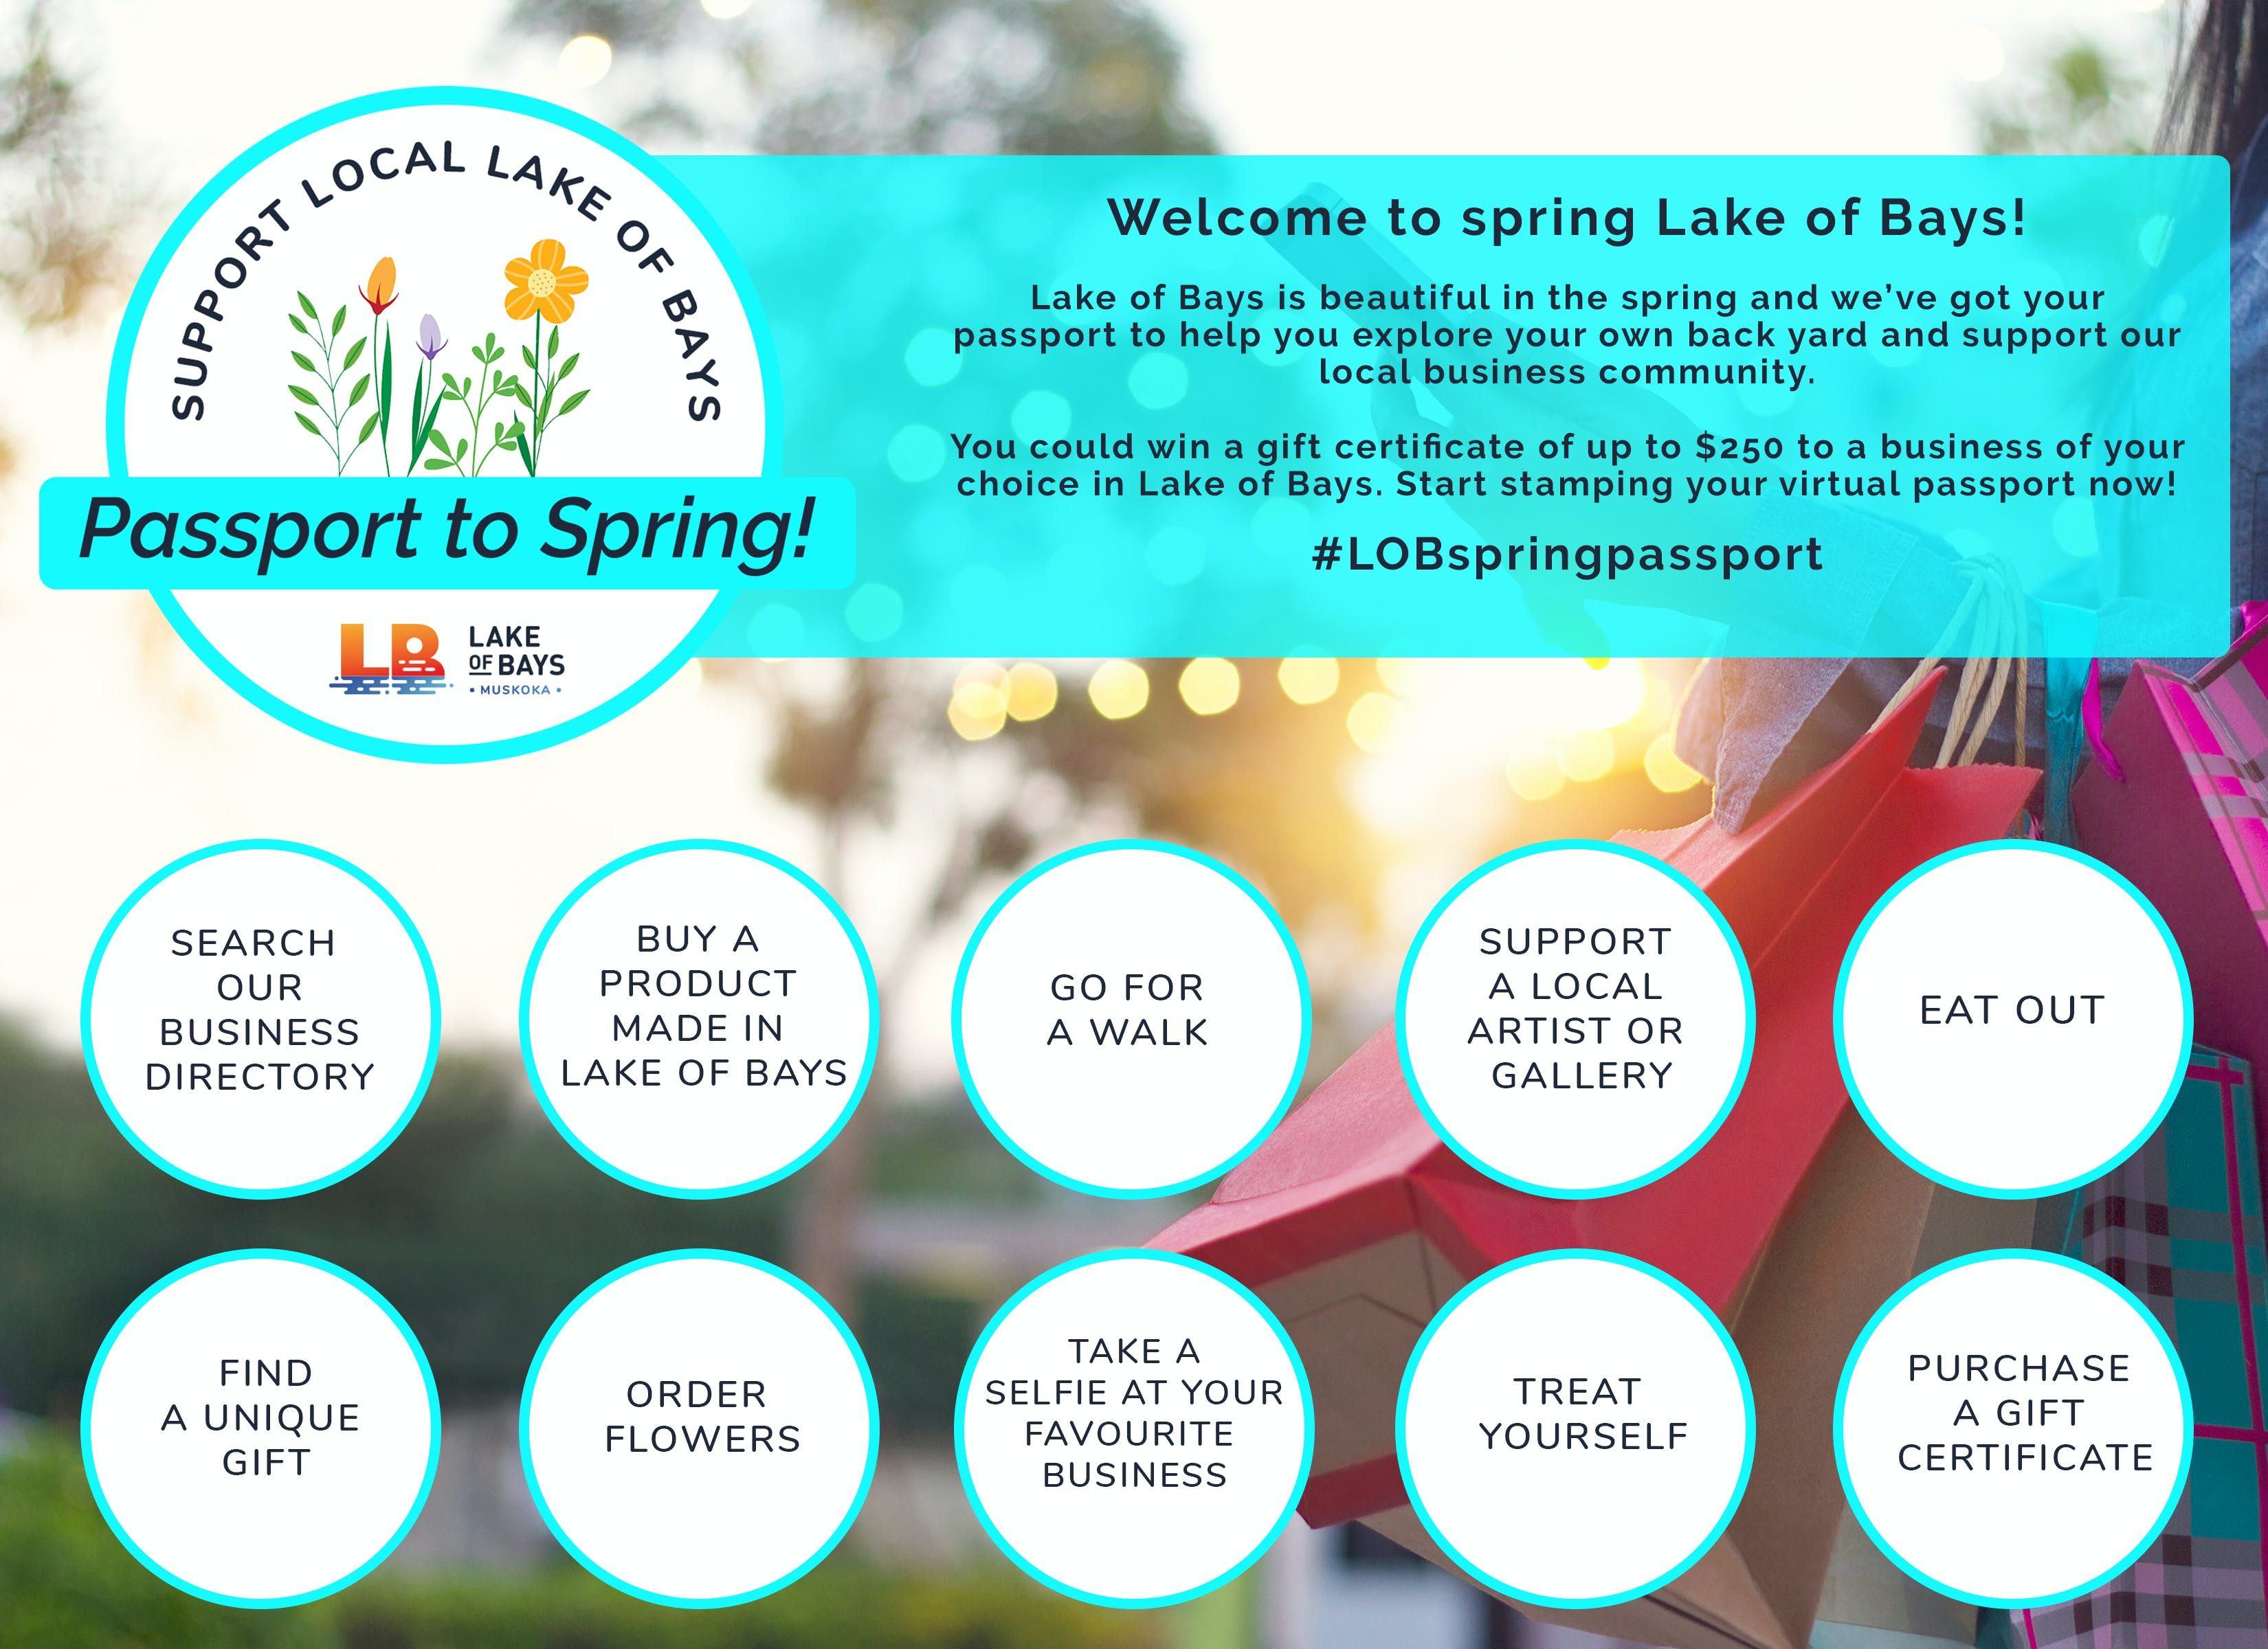 passport to spring passport card.jpg